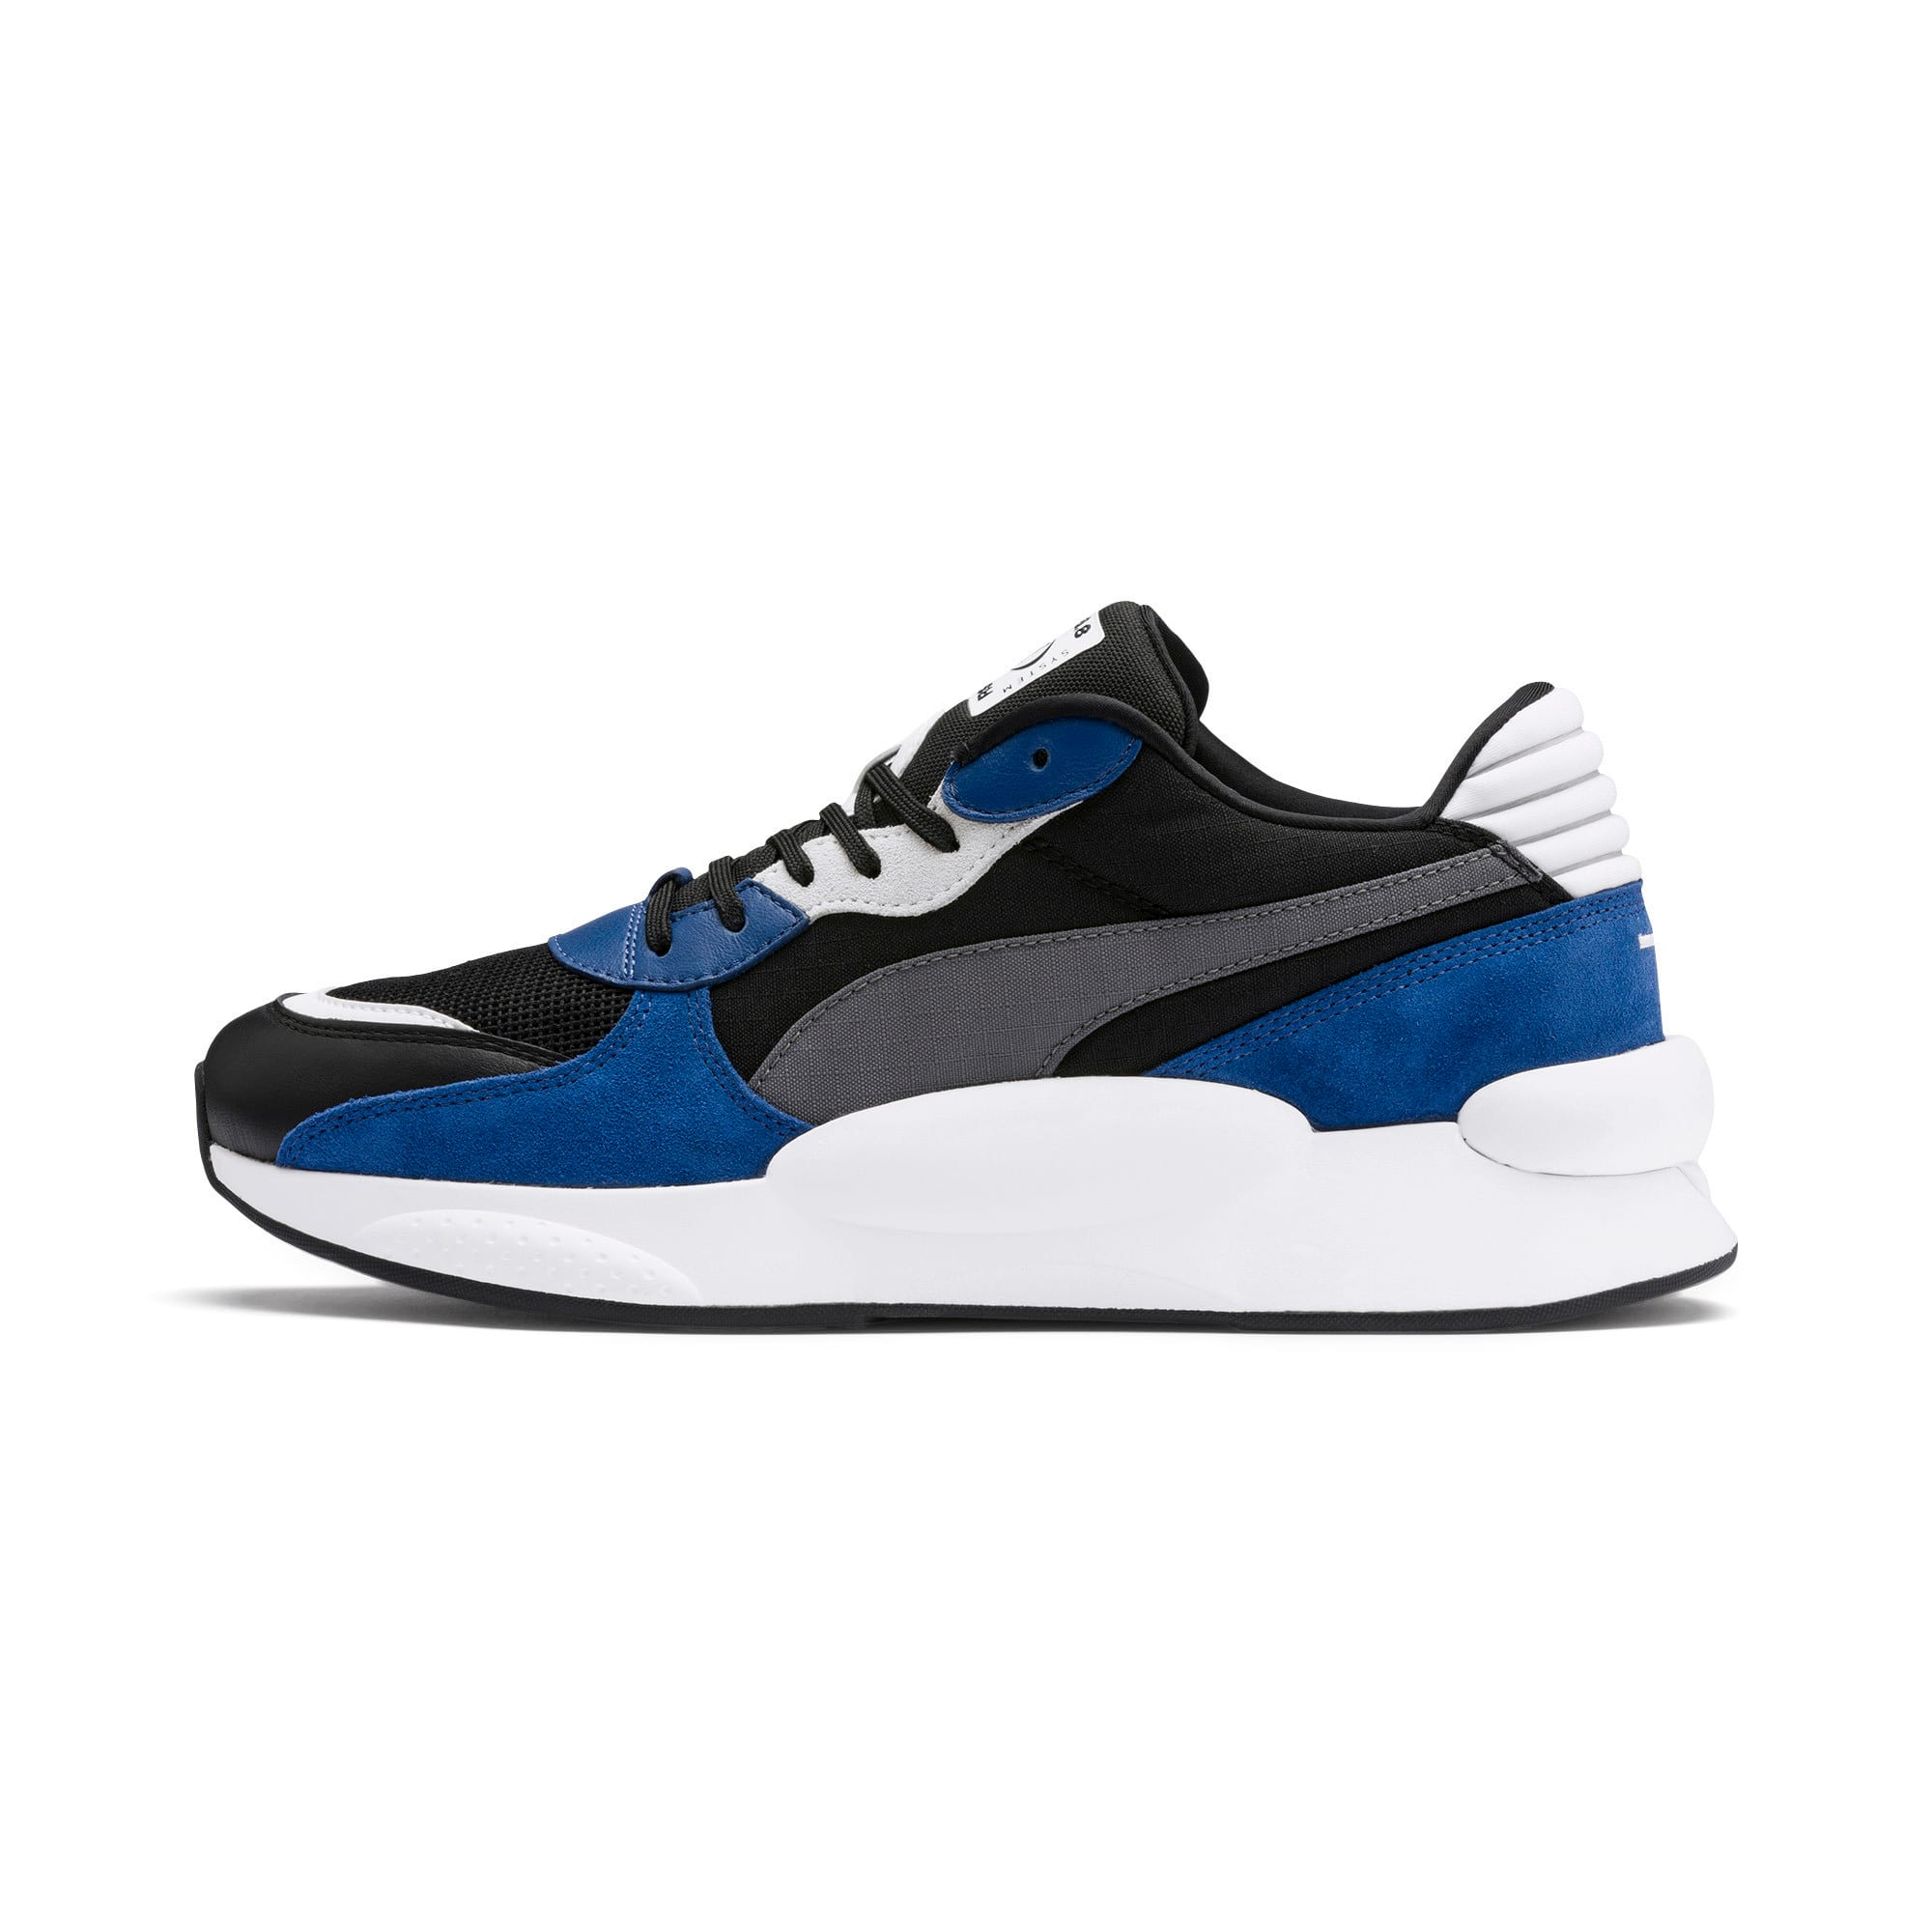 Thumbnail 1 of RS 9.8 Space Sneakers, Puma Black-Galaxy Blue, medium